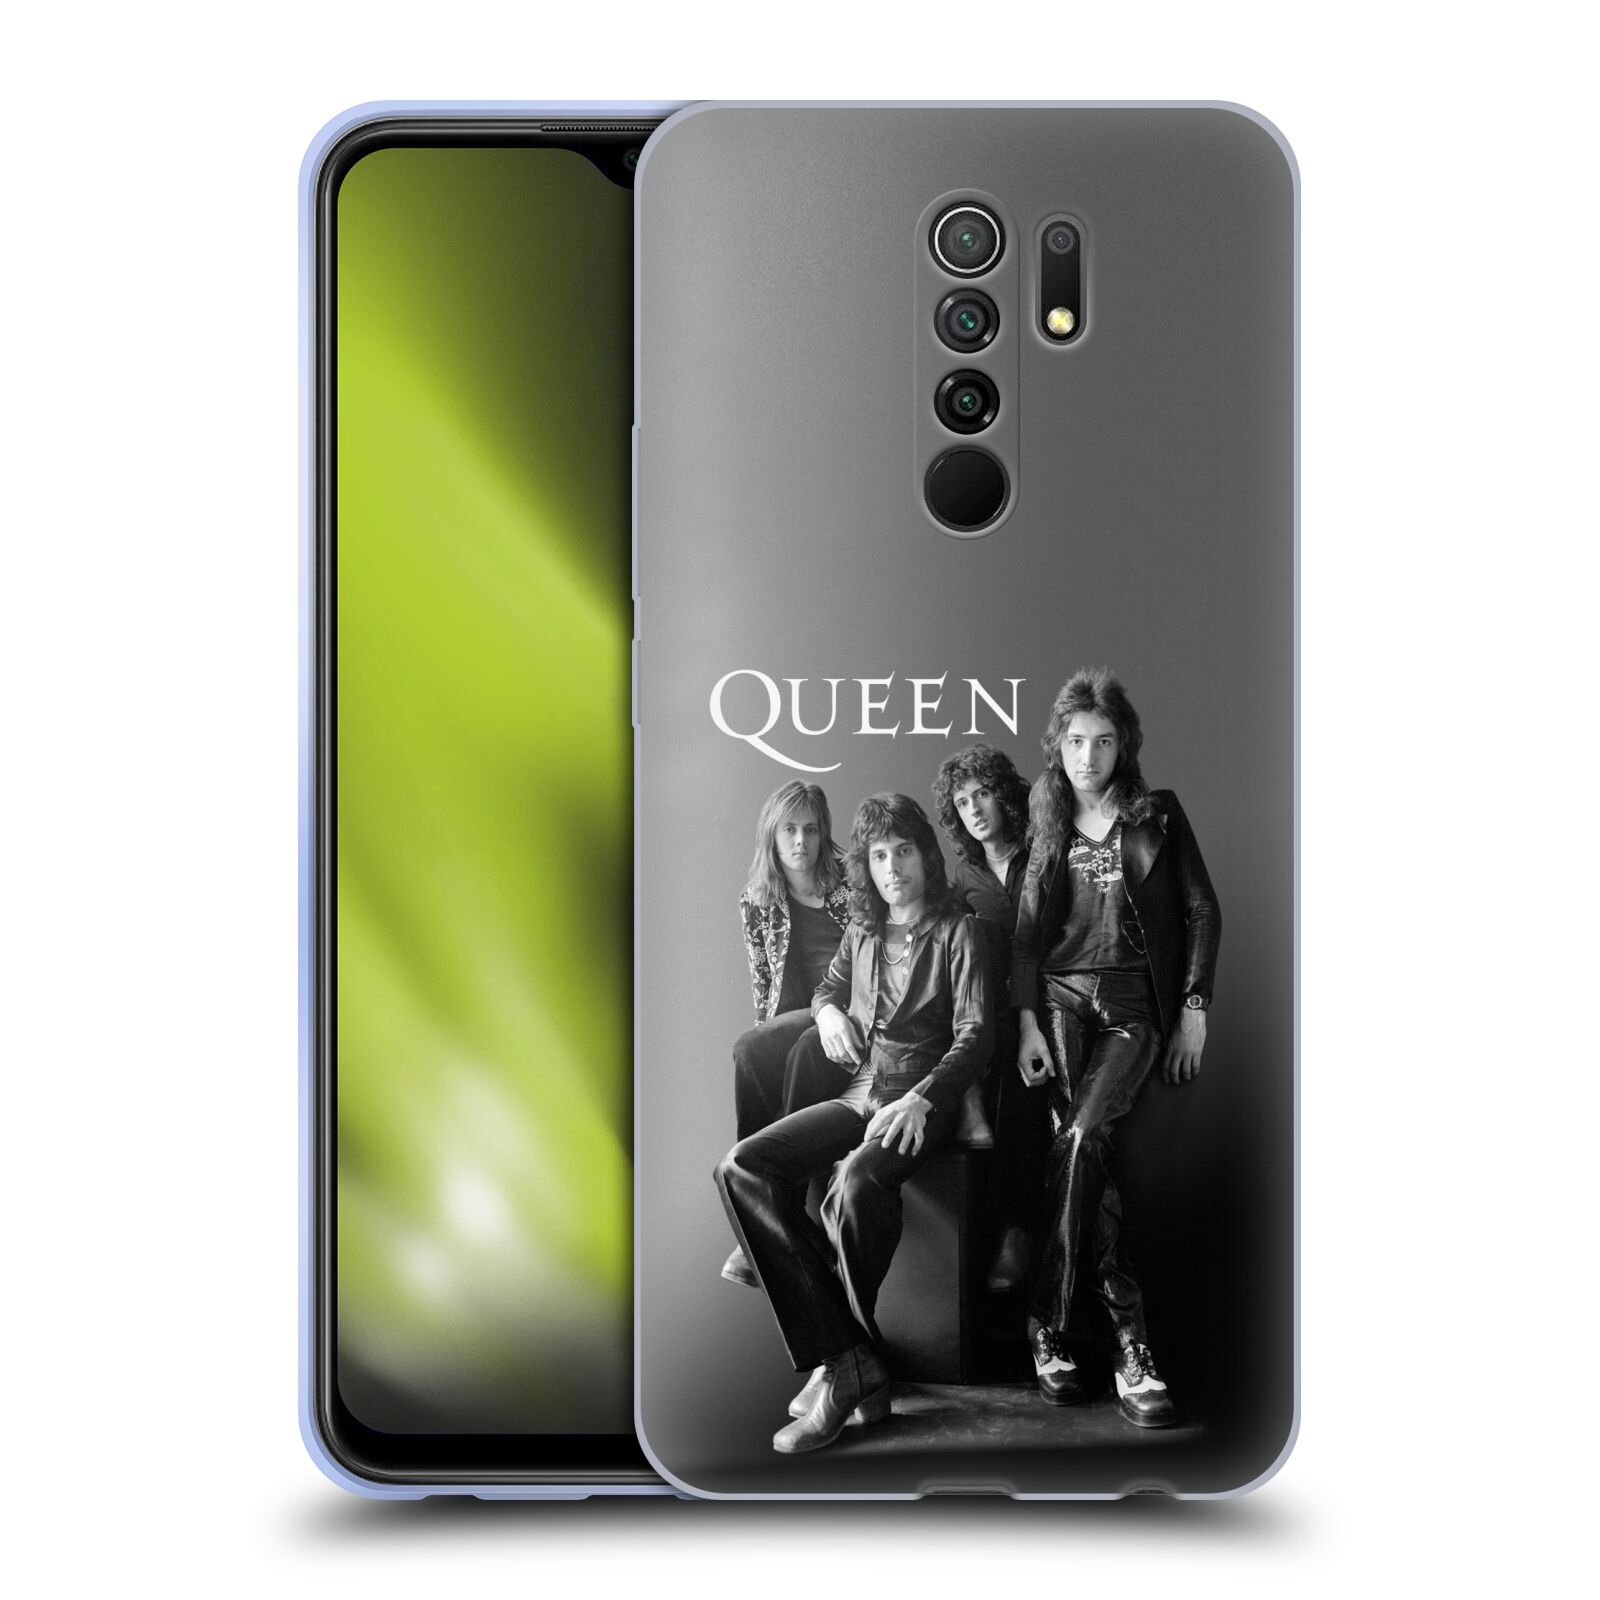 Silikonové pouzdro na mobil Xiaomi Redmi 9 - Head Case - Queen - Skupina